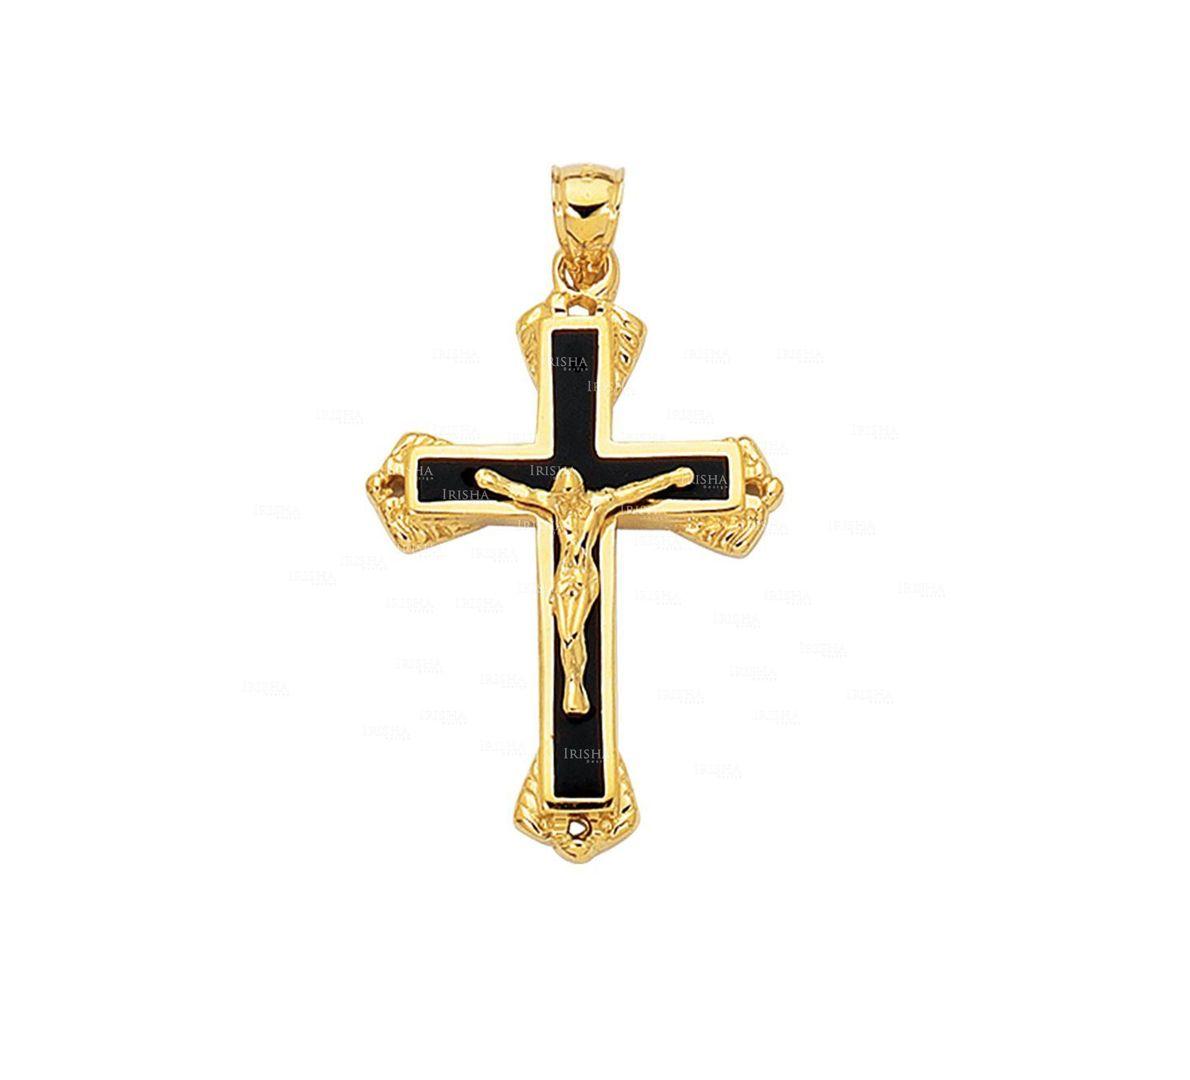 14K Yellow Gold Shiny Textured Fancy Black Cross with Figurine ChristmasPendant